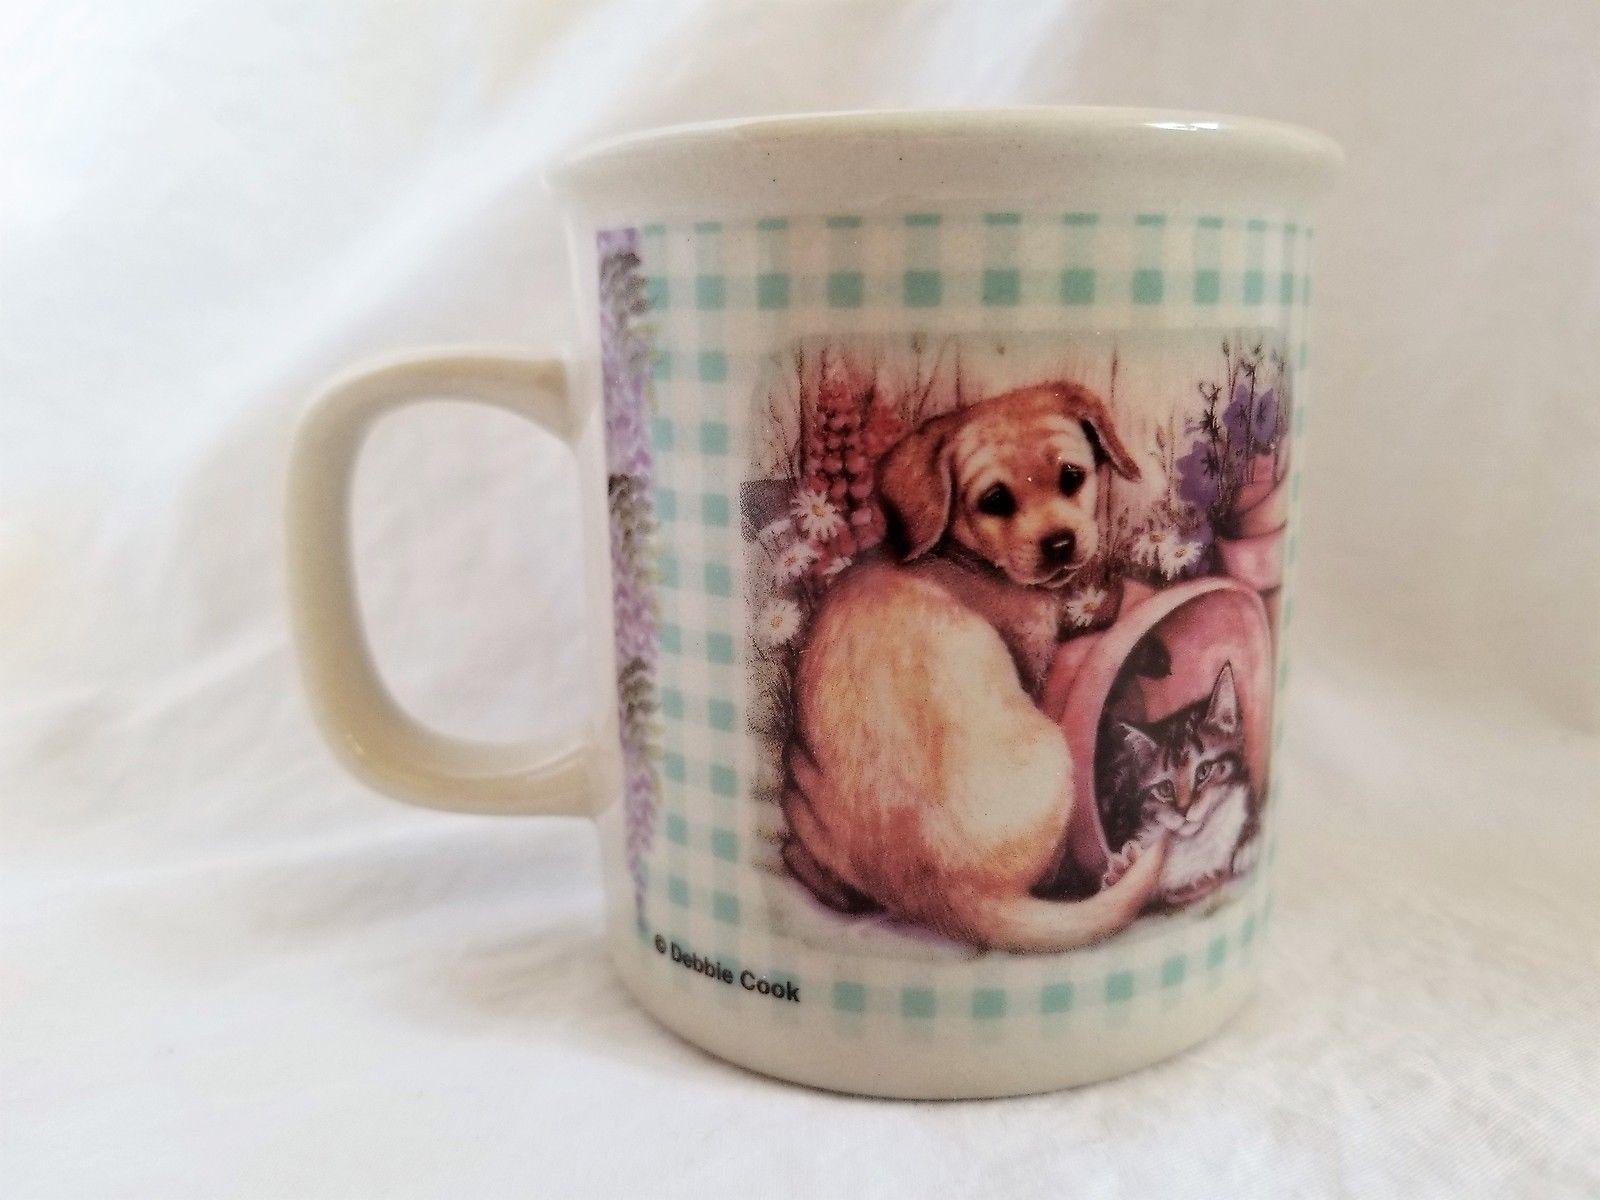 Puppy Kitten Cat Dog Mug Debbie Cook Prurple Planters Sleeping Quilt